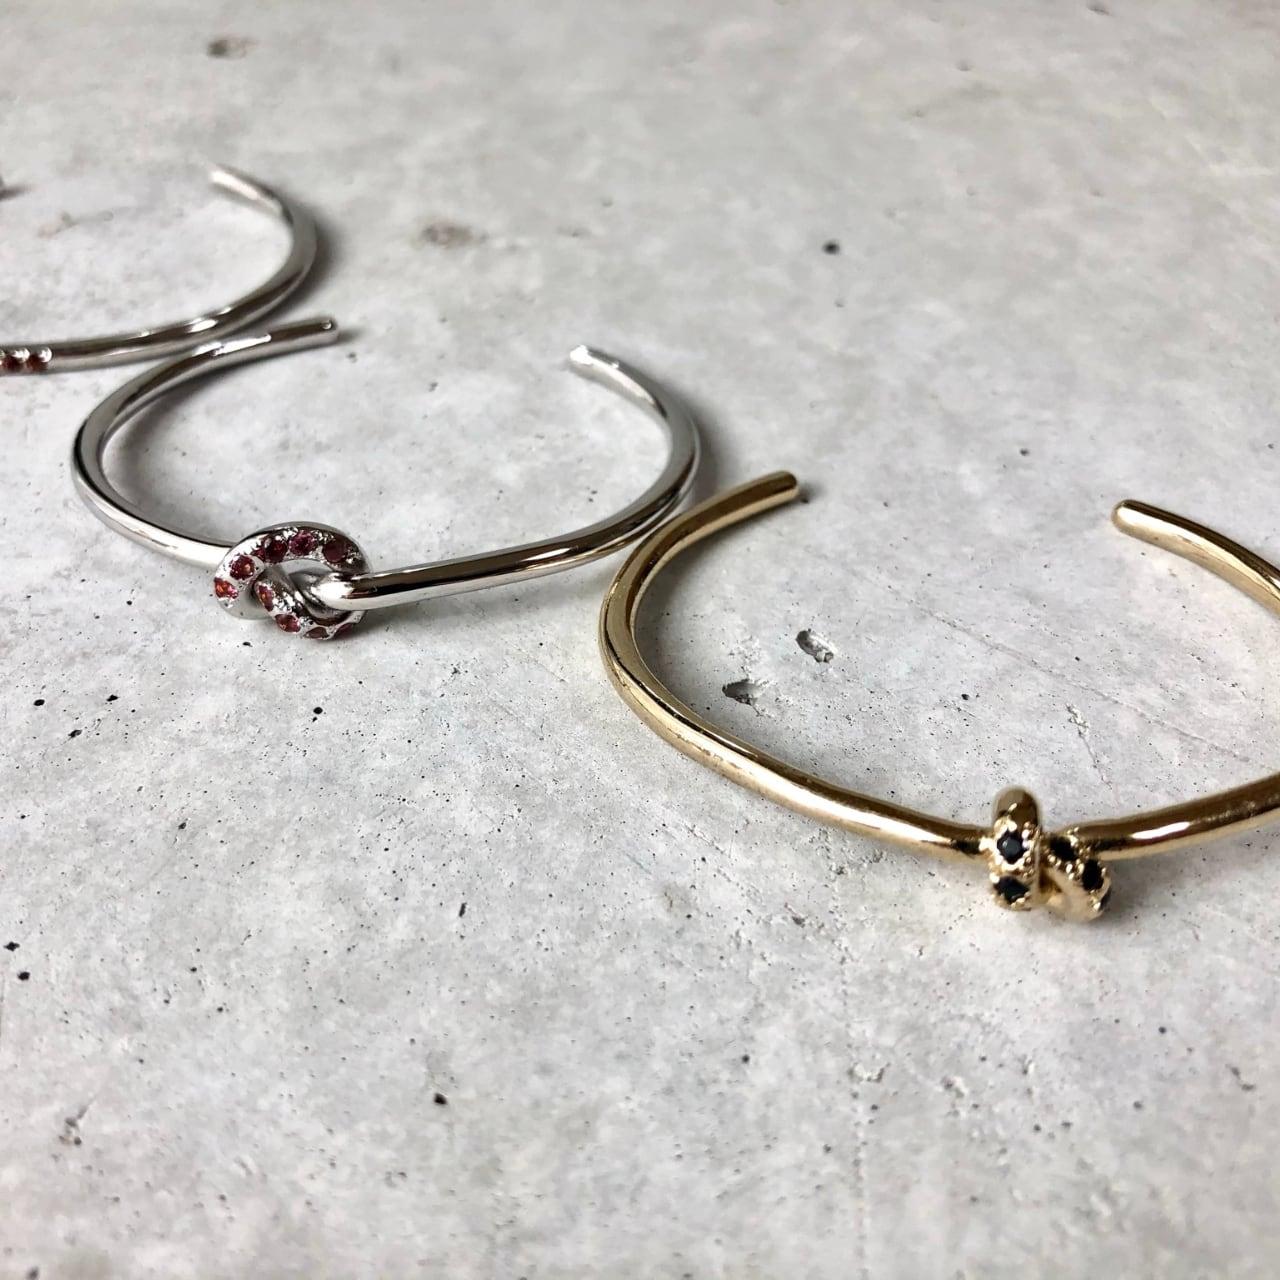 【LB-8BR】Knot bangle BK Sapphire ×G  Cinnamon garnet×S <再入荷>